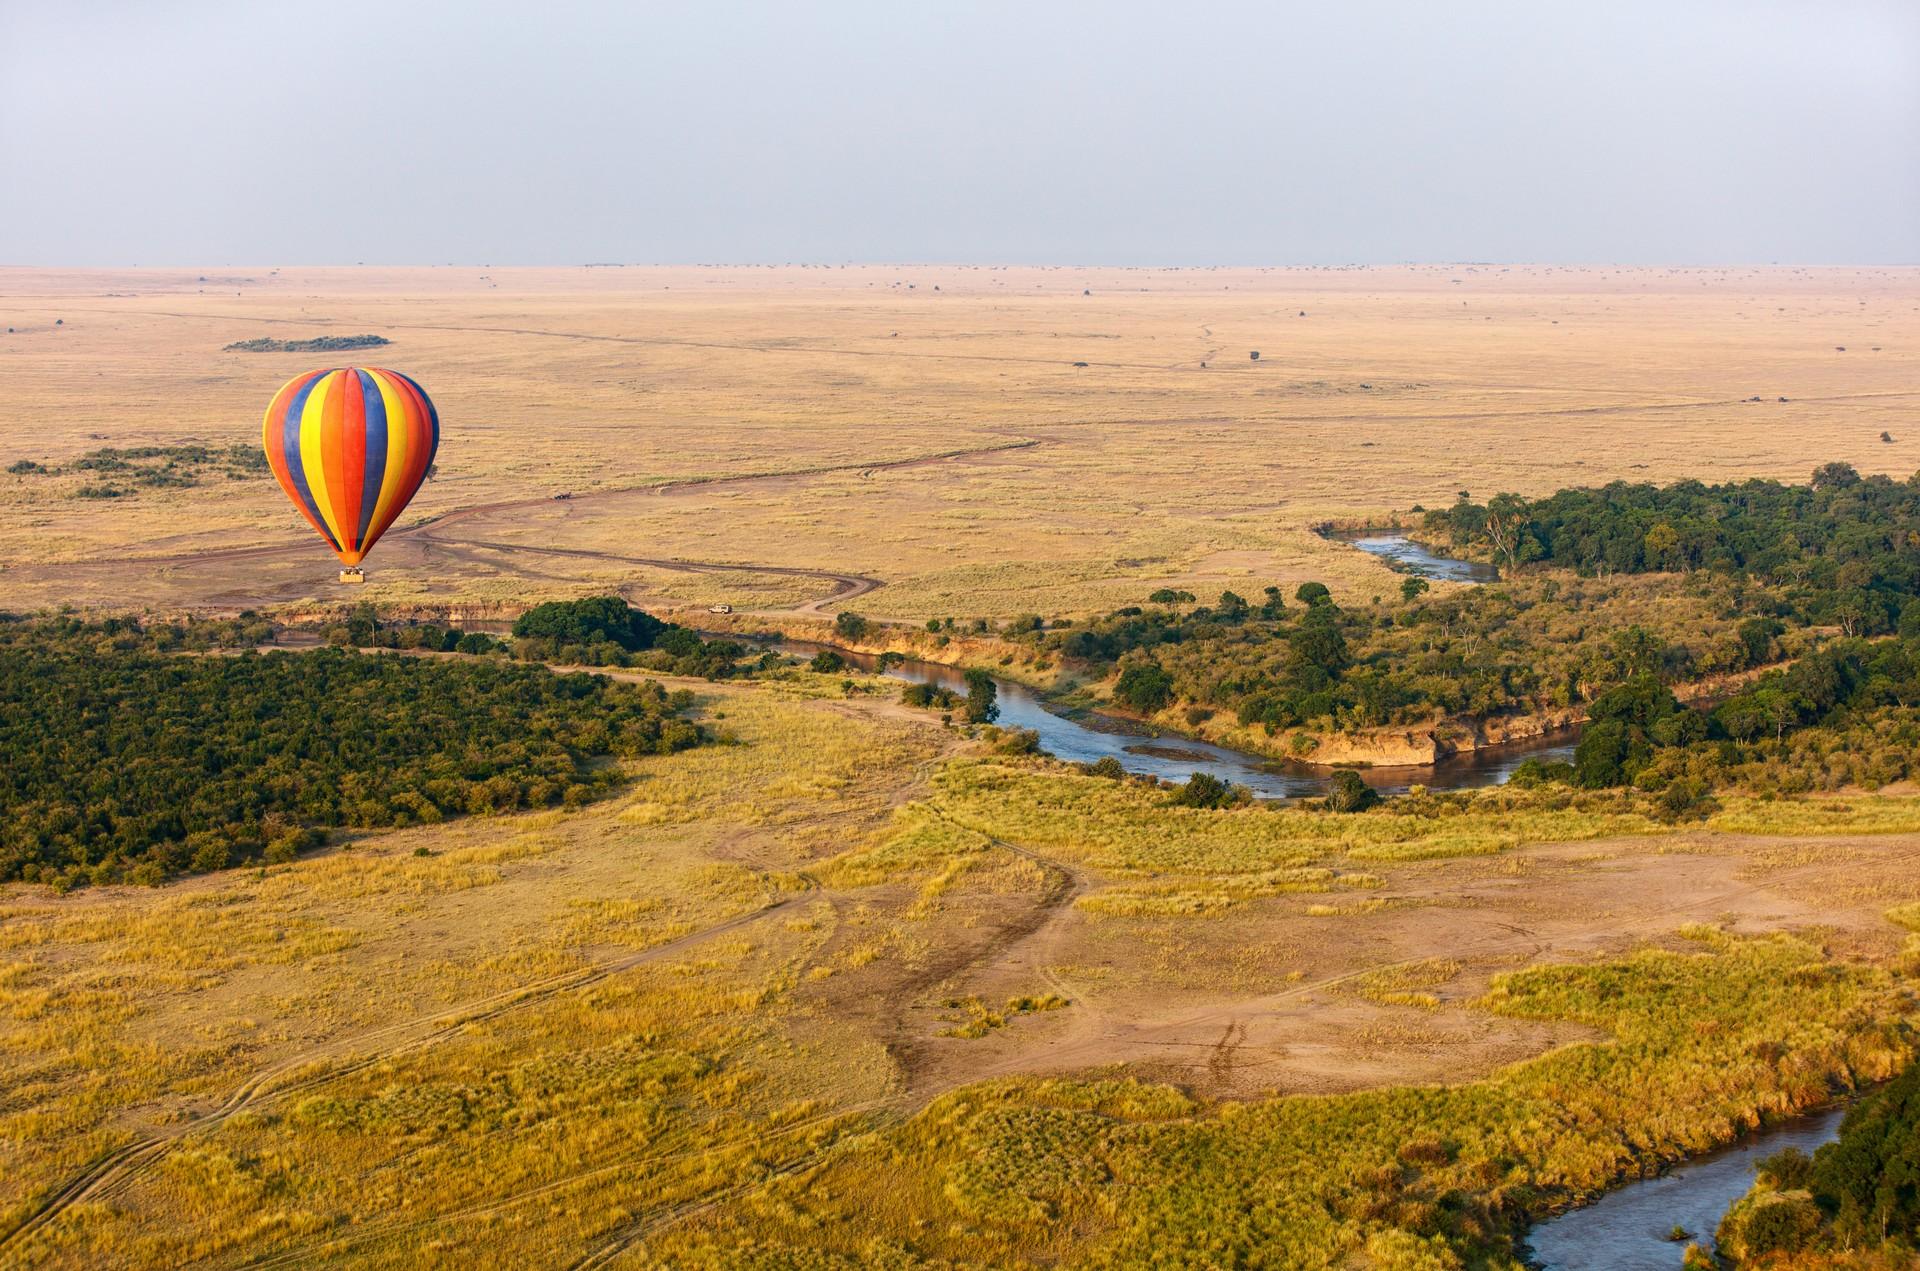 A hot air balloon ride over the Masai Mara in Kenya